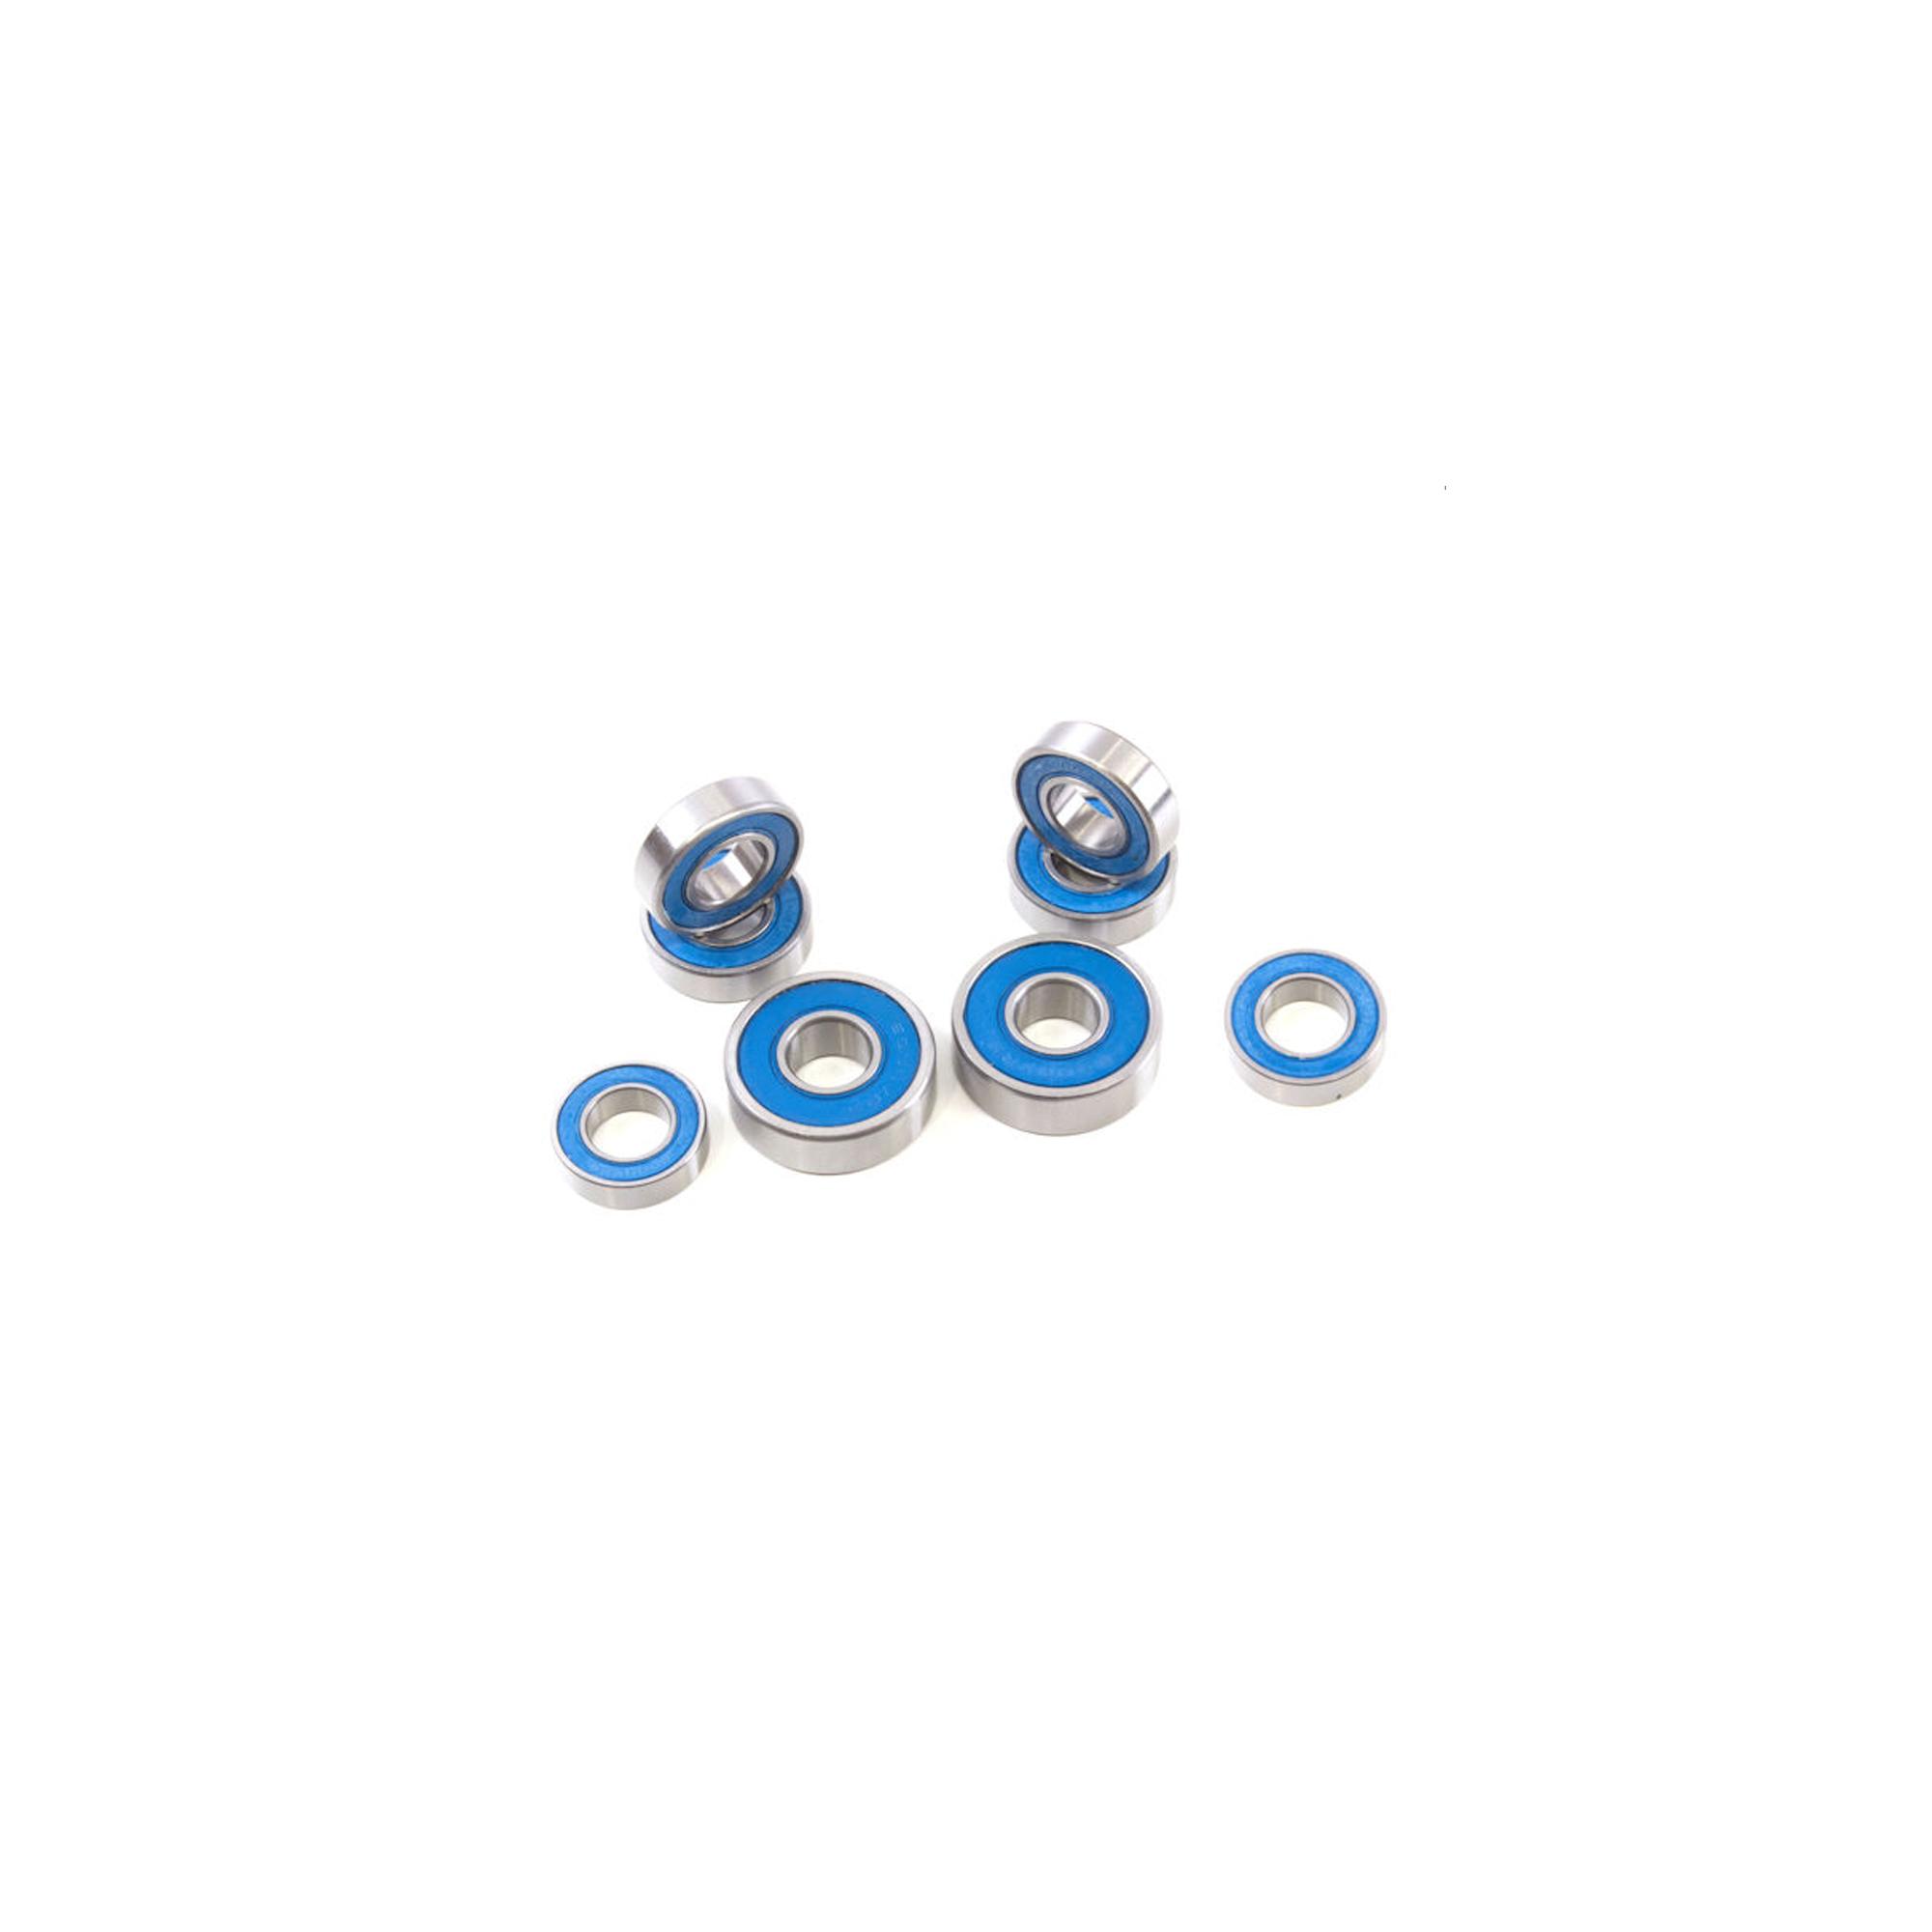 Mondraker Foxy ALU 2017 Bearing Kit